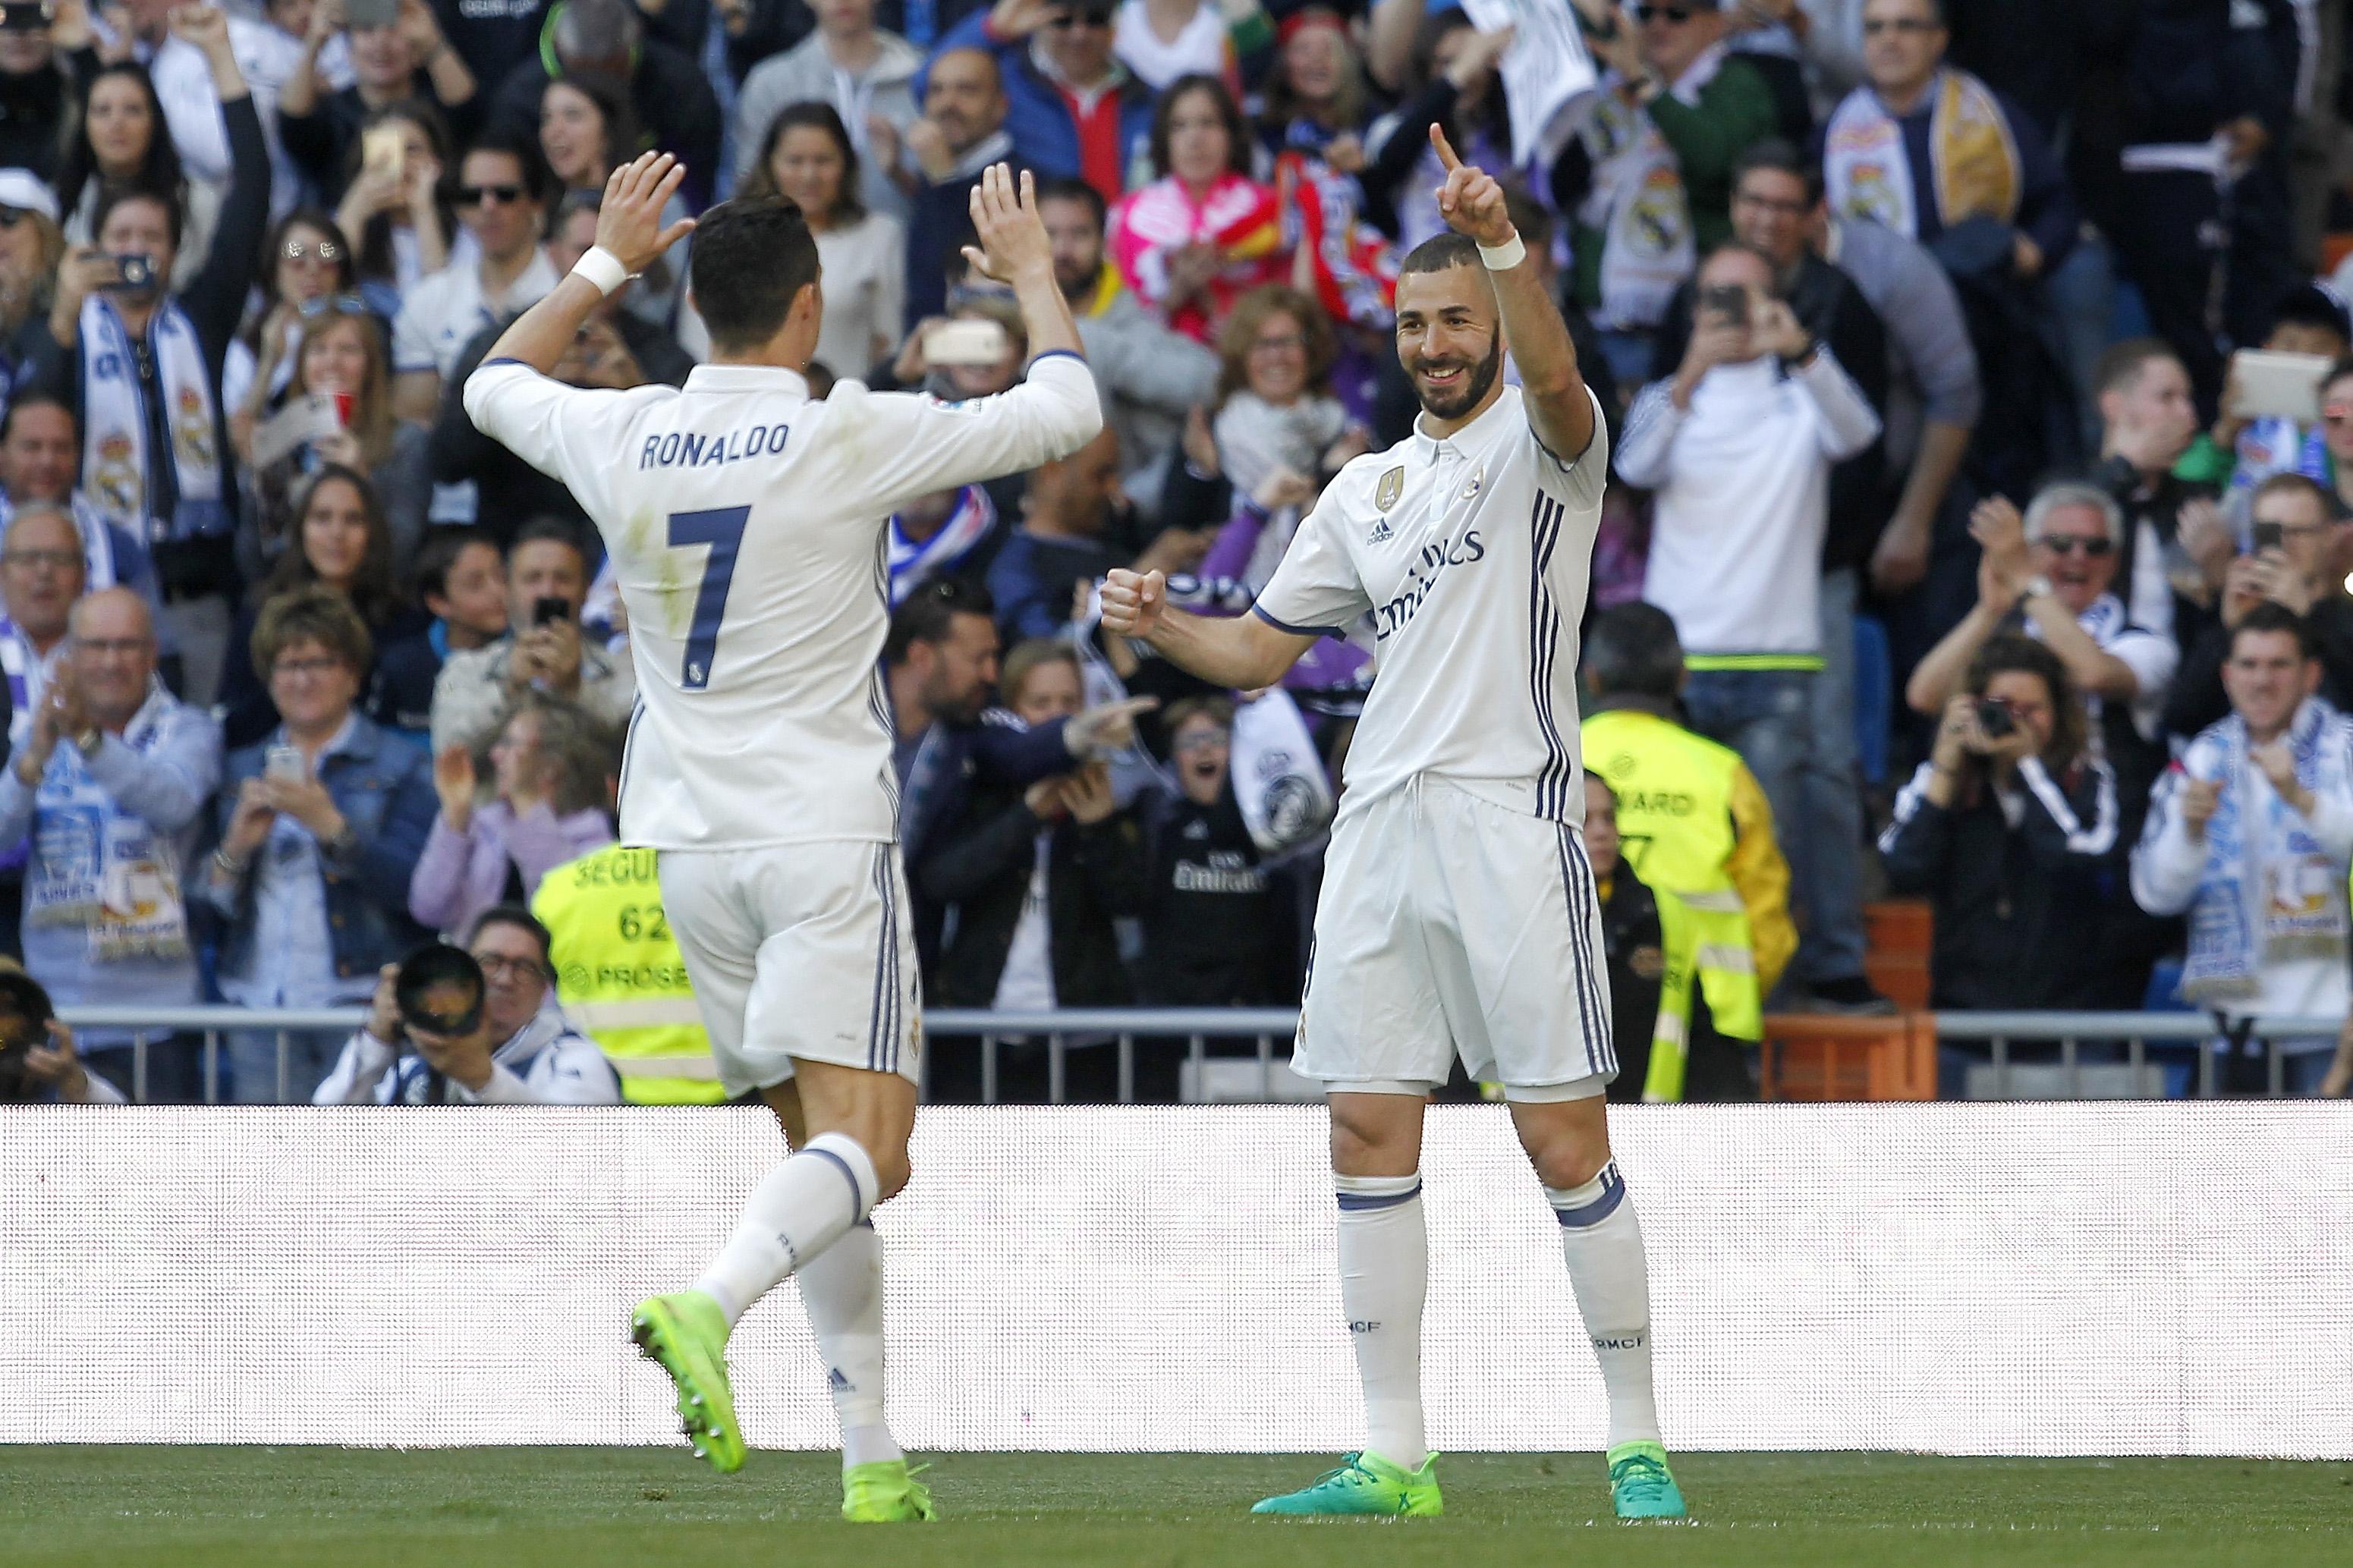 Watch Getafe Cf Vs Real Madrid Live Stream La Liga: Leganes Vs. Real Madrid Live Stream: Watch La Liga Online